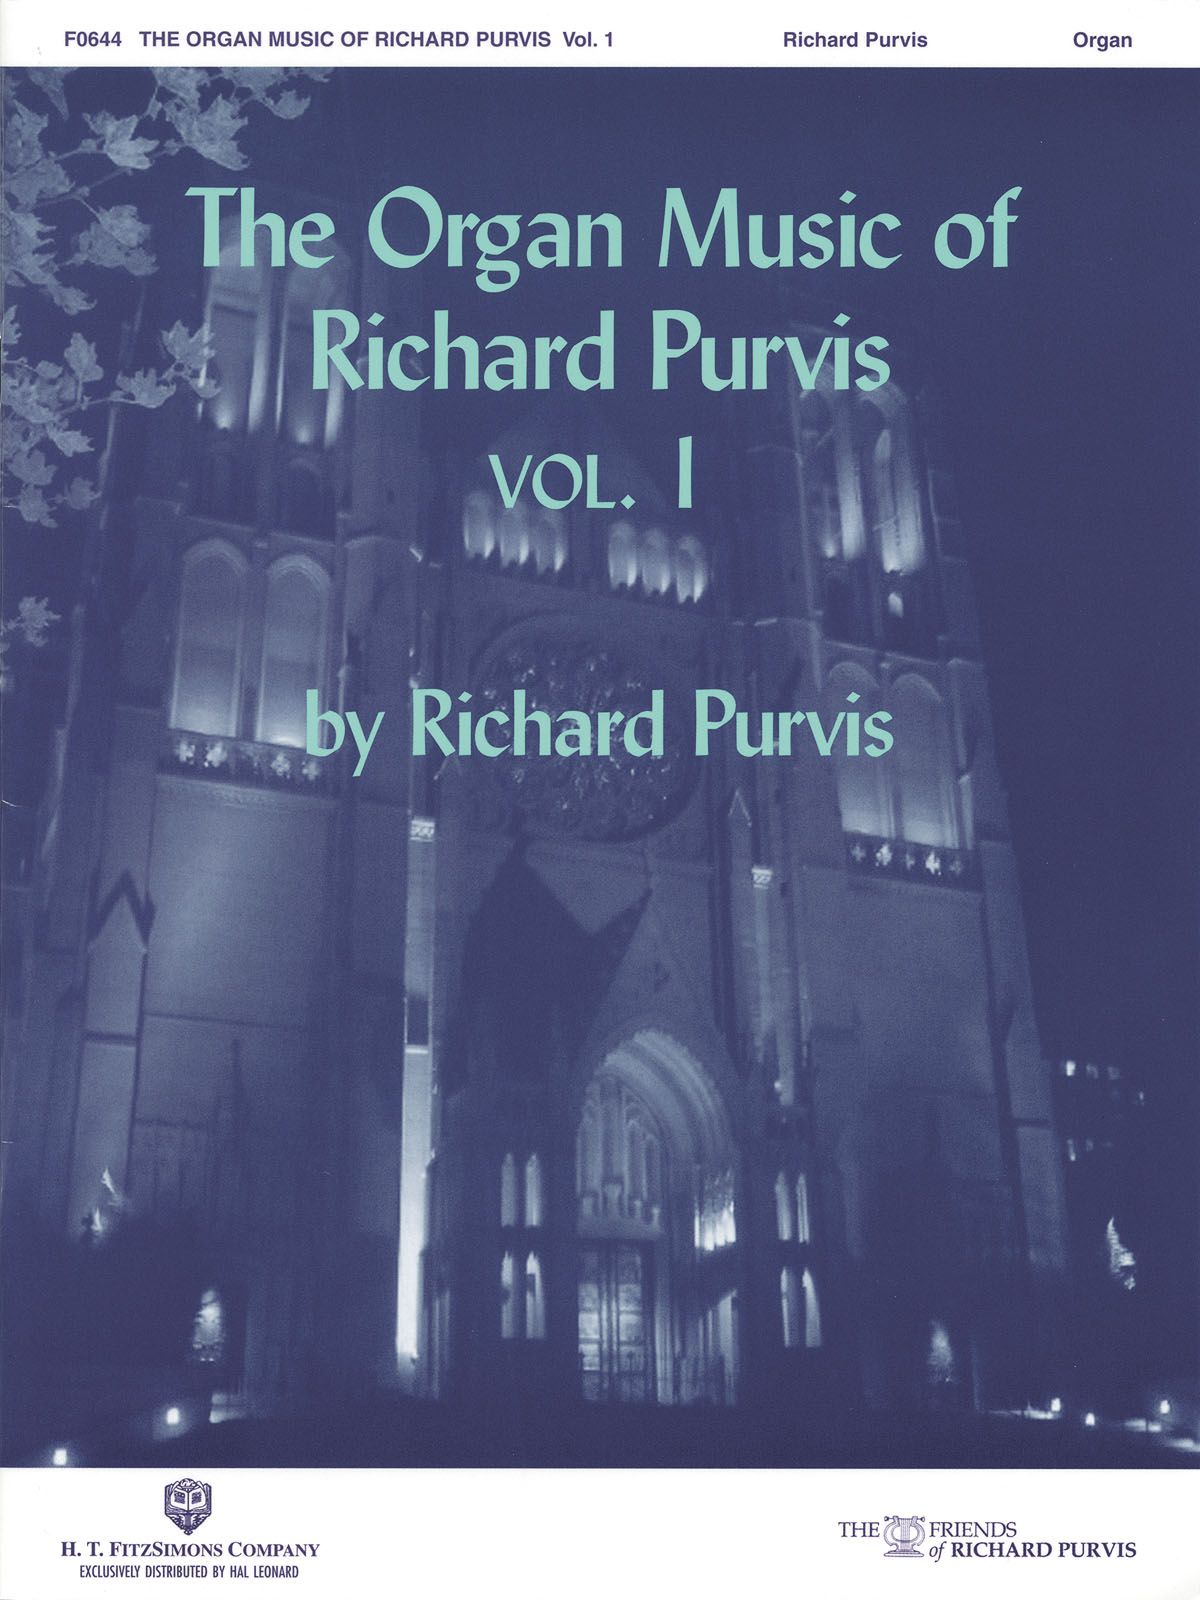 Richard Purvis: The Organ Music of Richard Purvis - Volume 1: Organ: